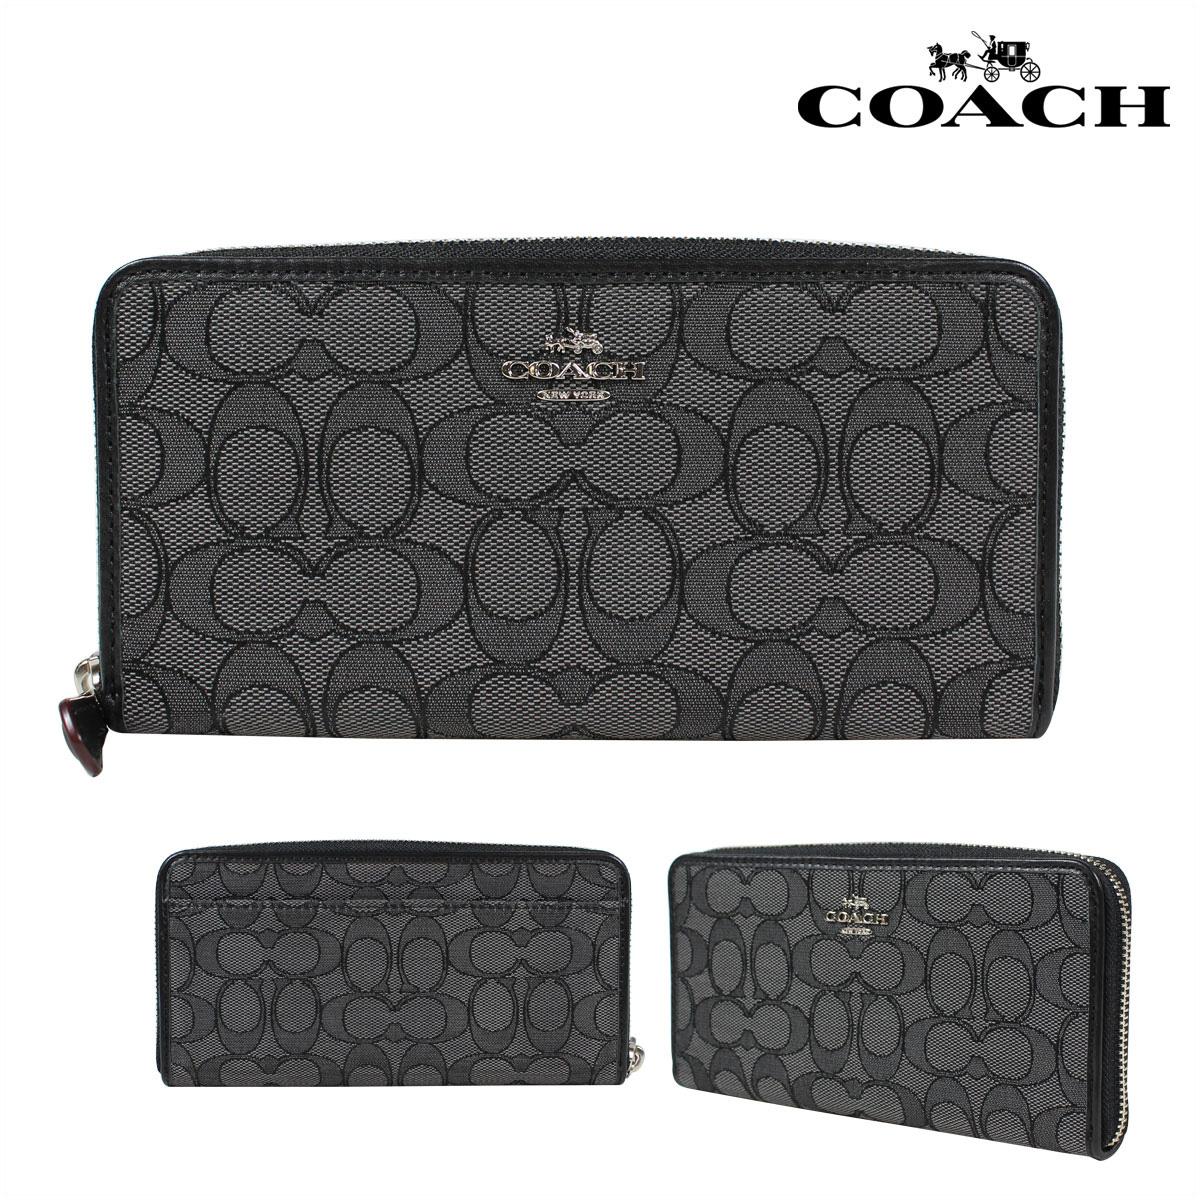 COACH コーチ 財布 長財布 F54633 スモークブラック 黒×ブラック 黒 レディース